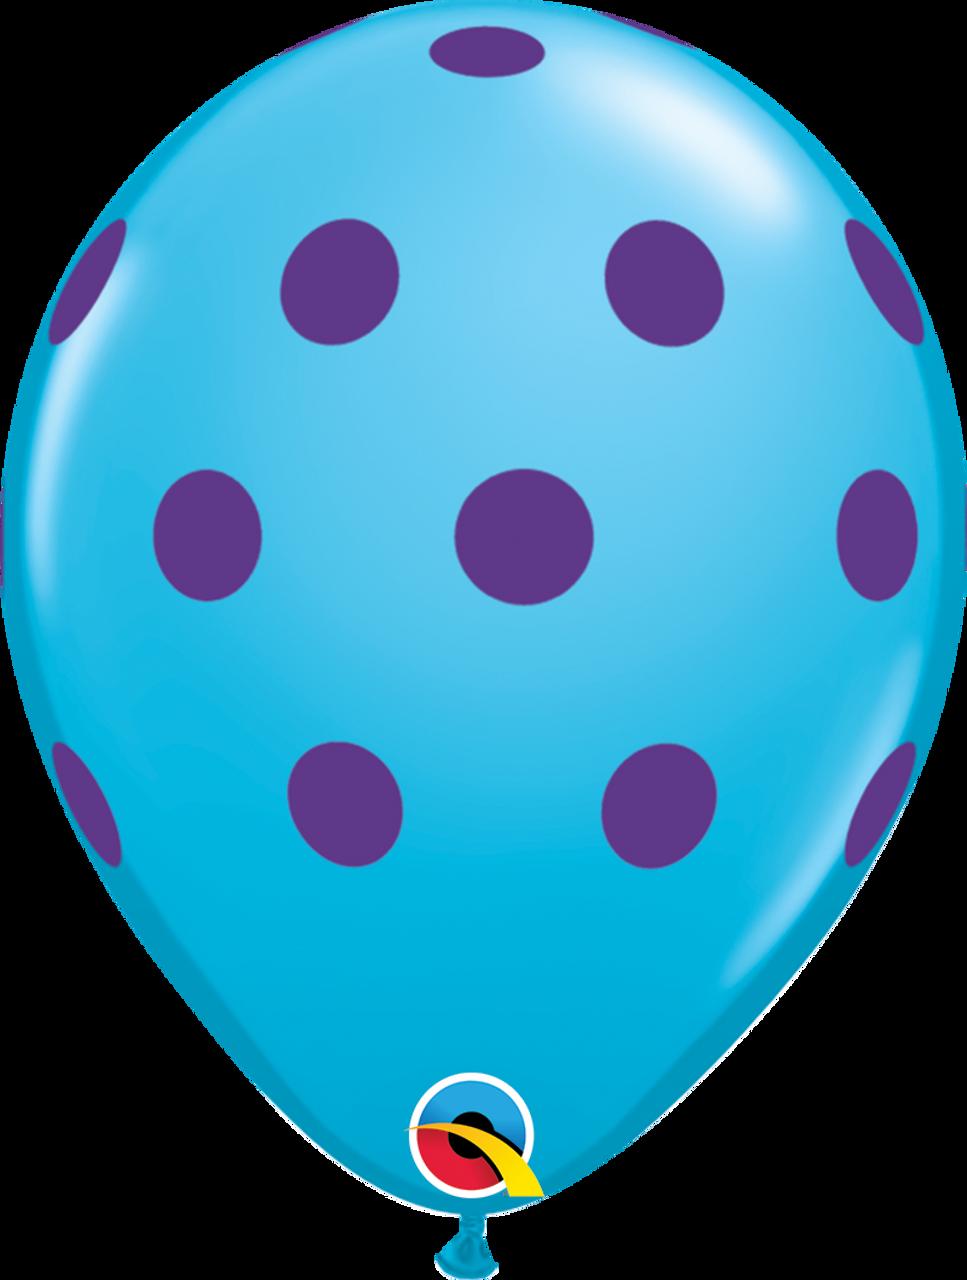 "10 x Qualatex Big Polka Dots Diamond Clear with Gold Spots 11/"" Latex Balloons"